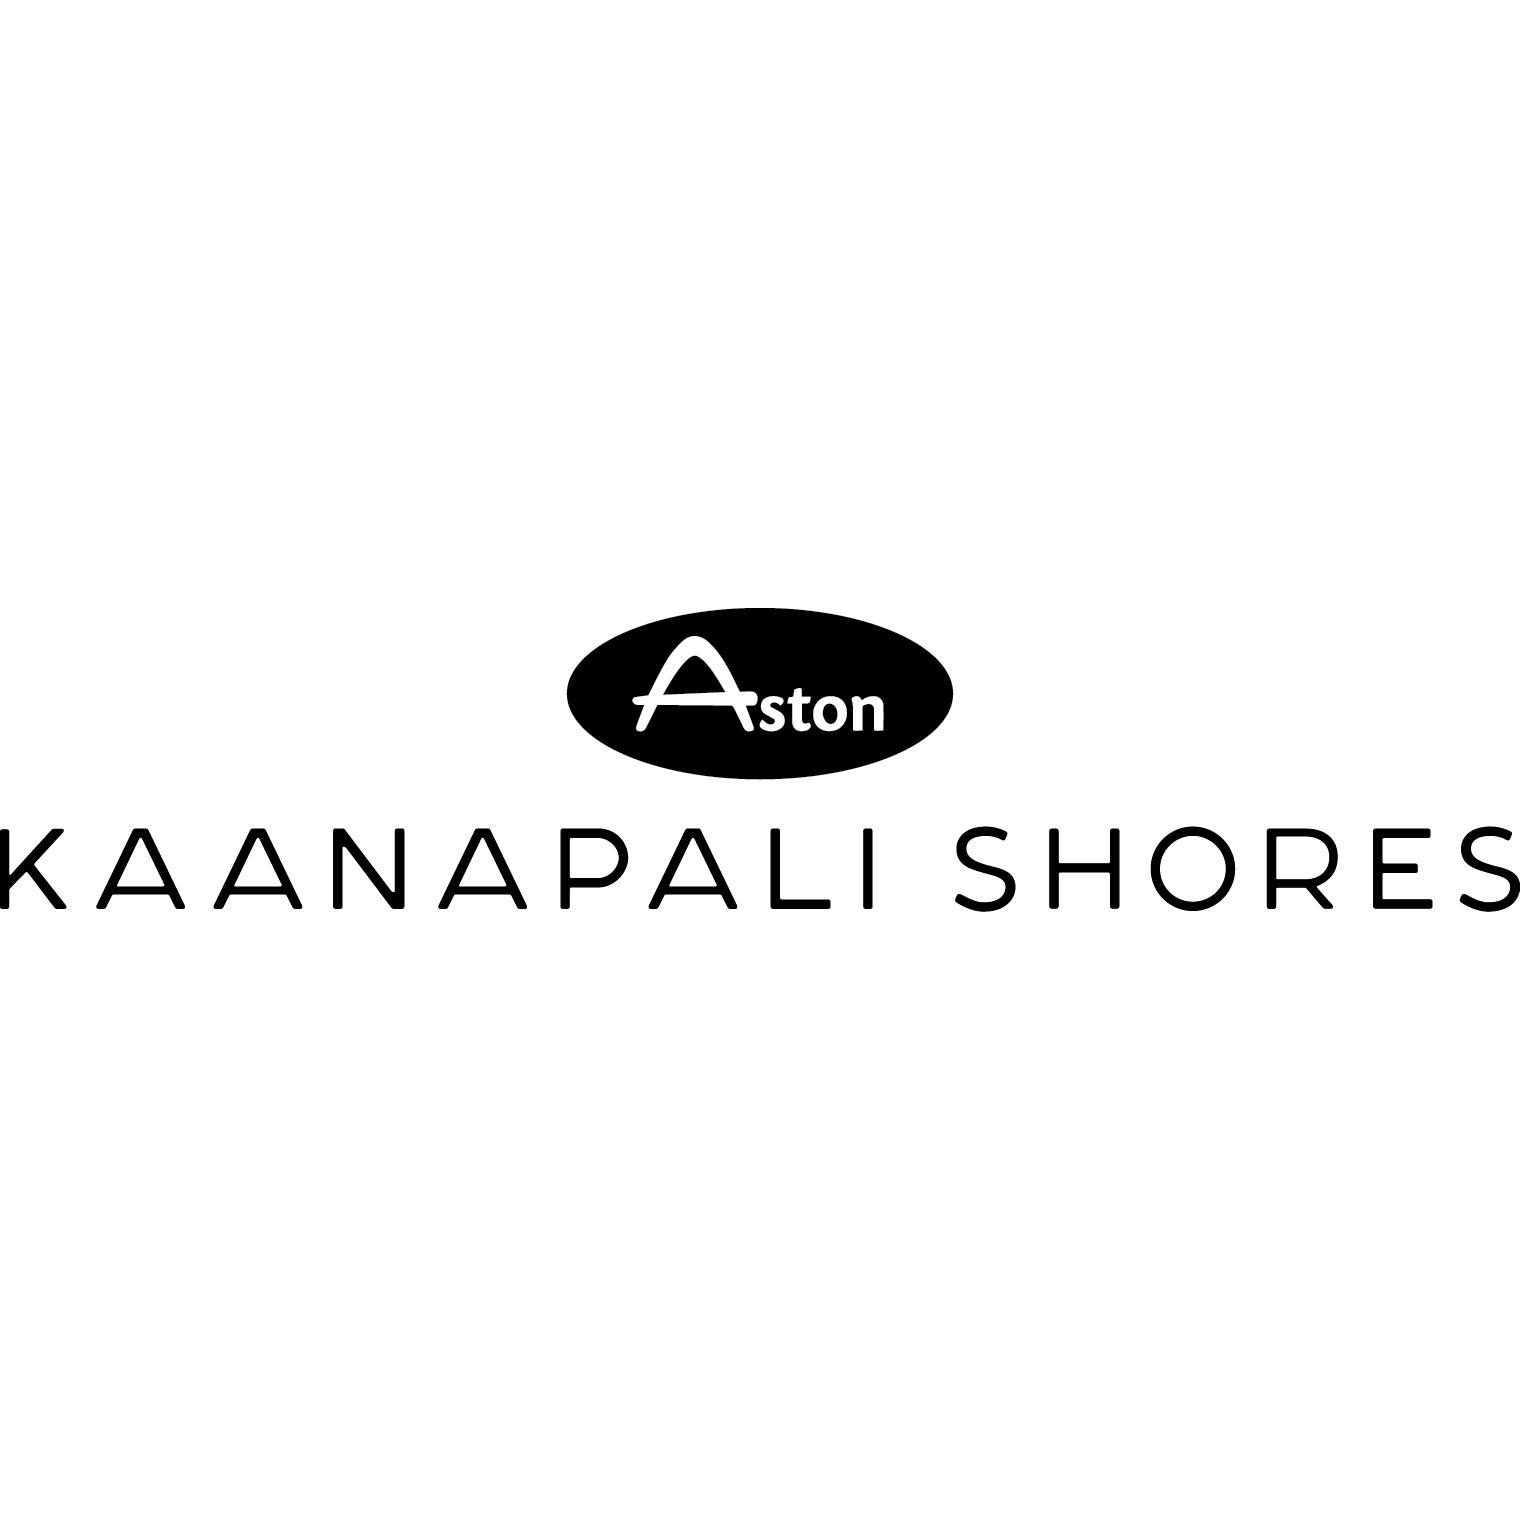 Aston Kaanapali Shores - Lahaina, HI - Hotels & Motels